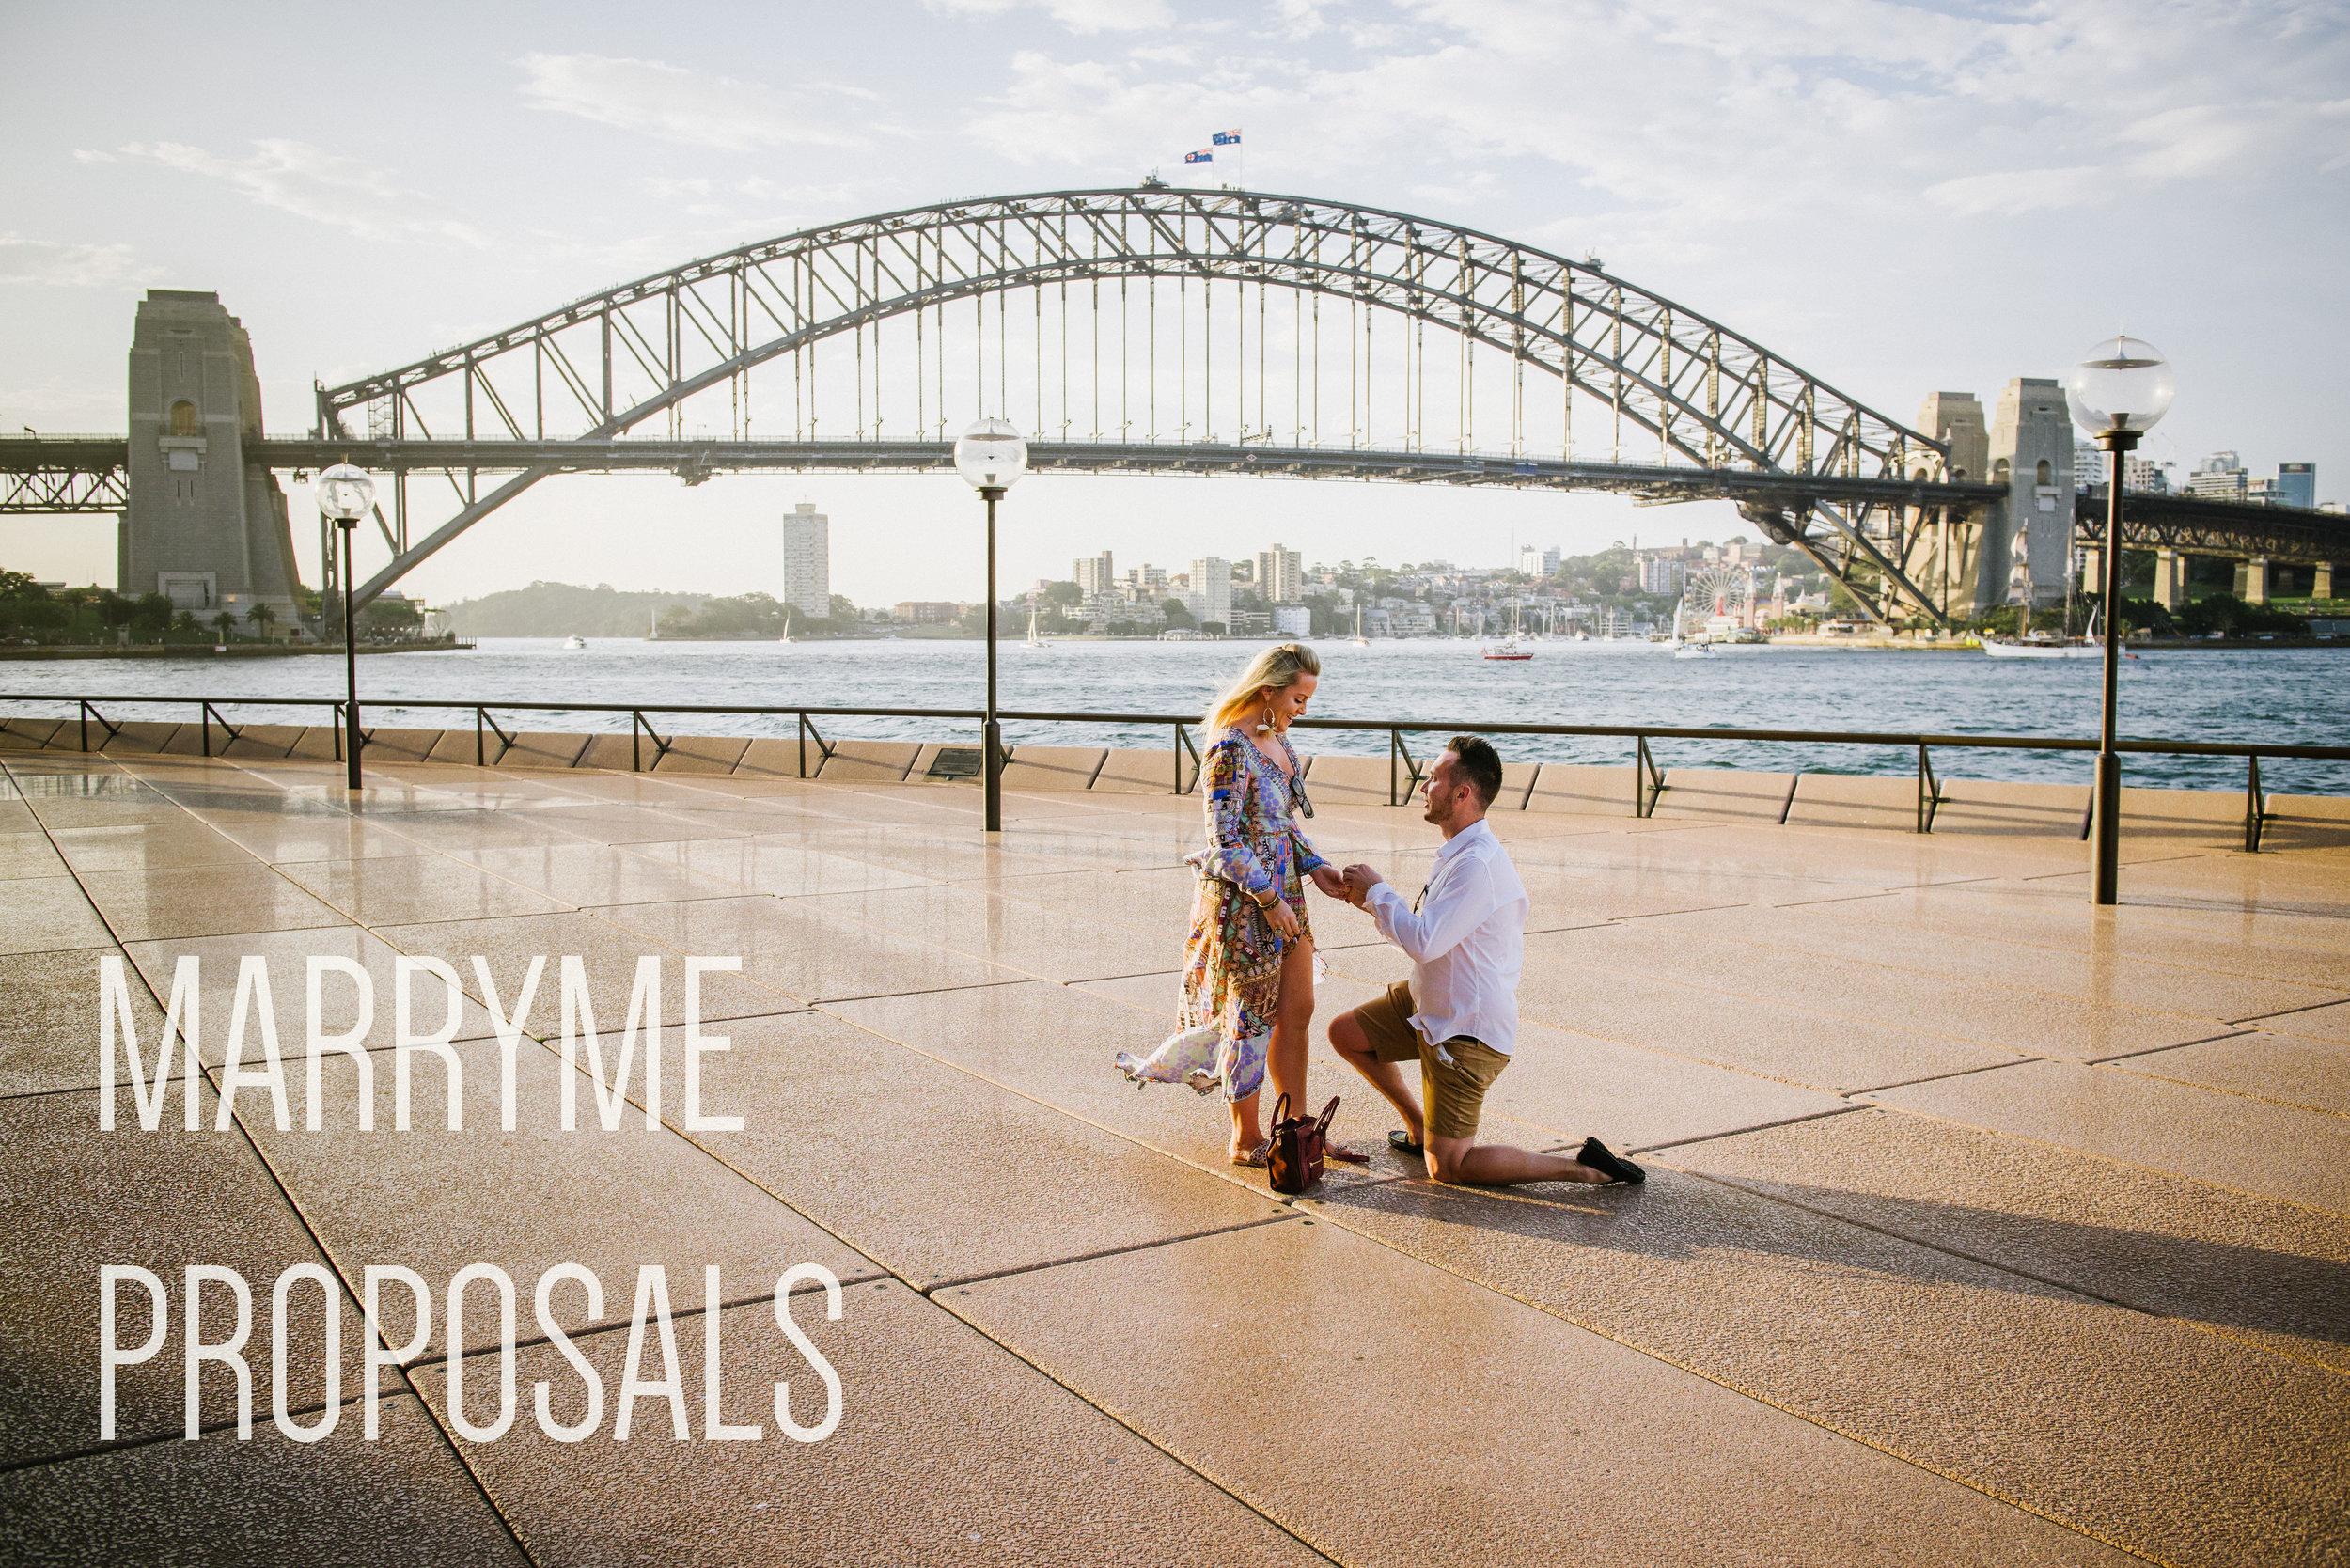 Marryme_marriage_proposal_sydney_3871x2583_2963061.jpg